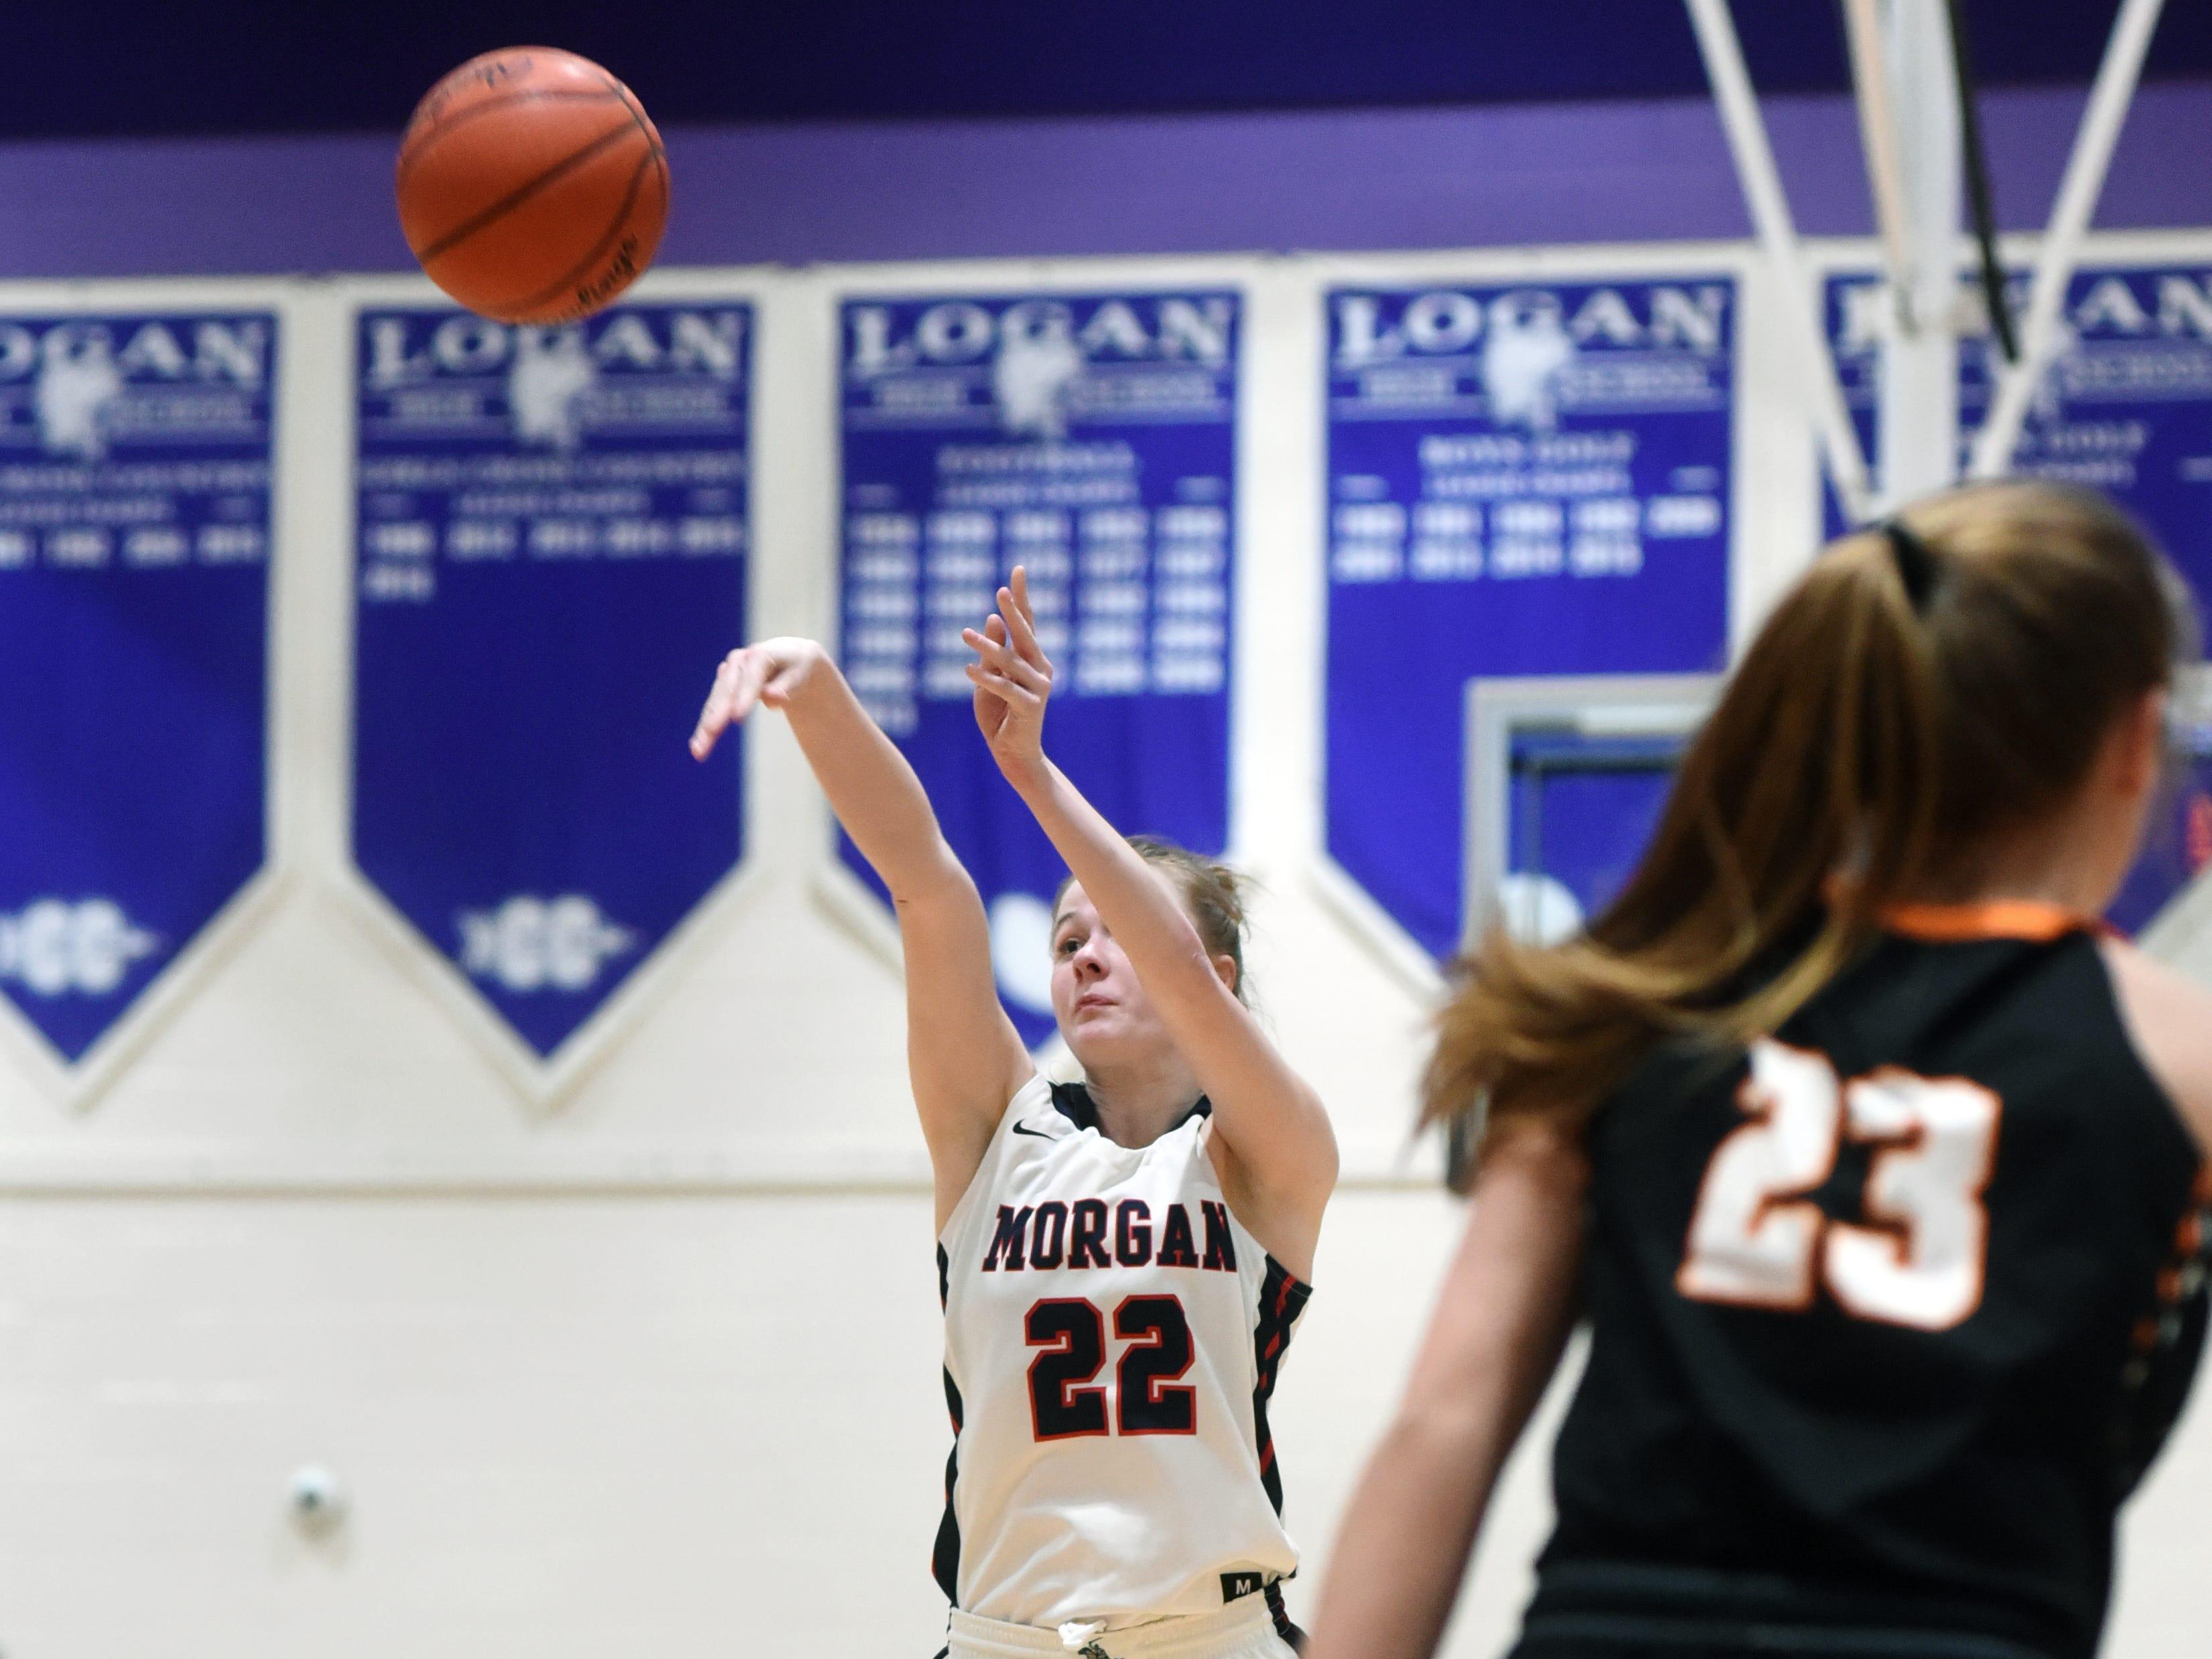 Sophia Smith shoots a 3 during Morgan's 56-55 loss to Wheelersburg in a Division III regional semifinal at Logan.